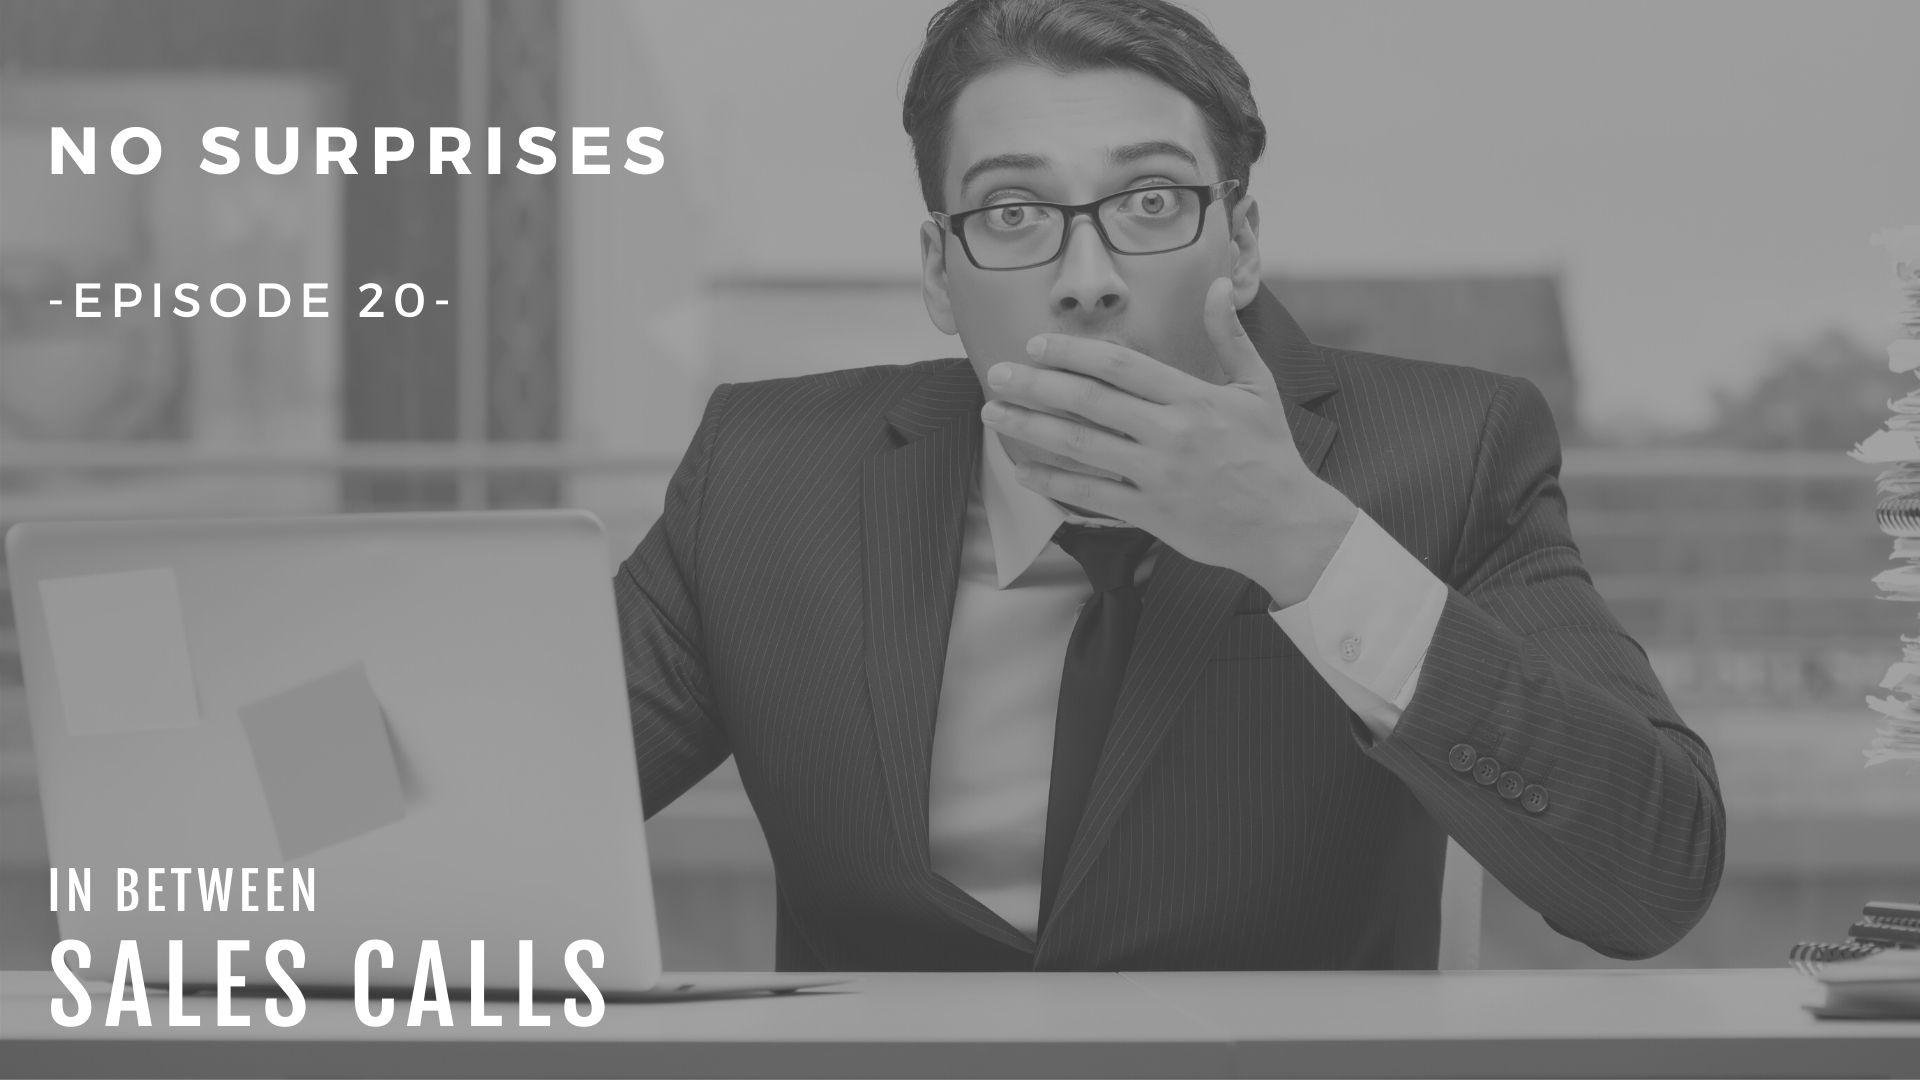 sales-philosophy-no-surprises-modern-sales-training-in-between-sales-calls-podcast